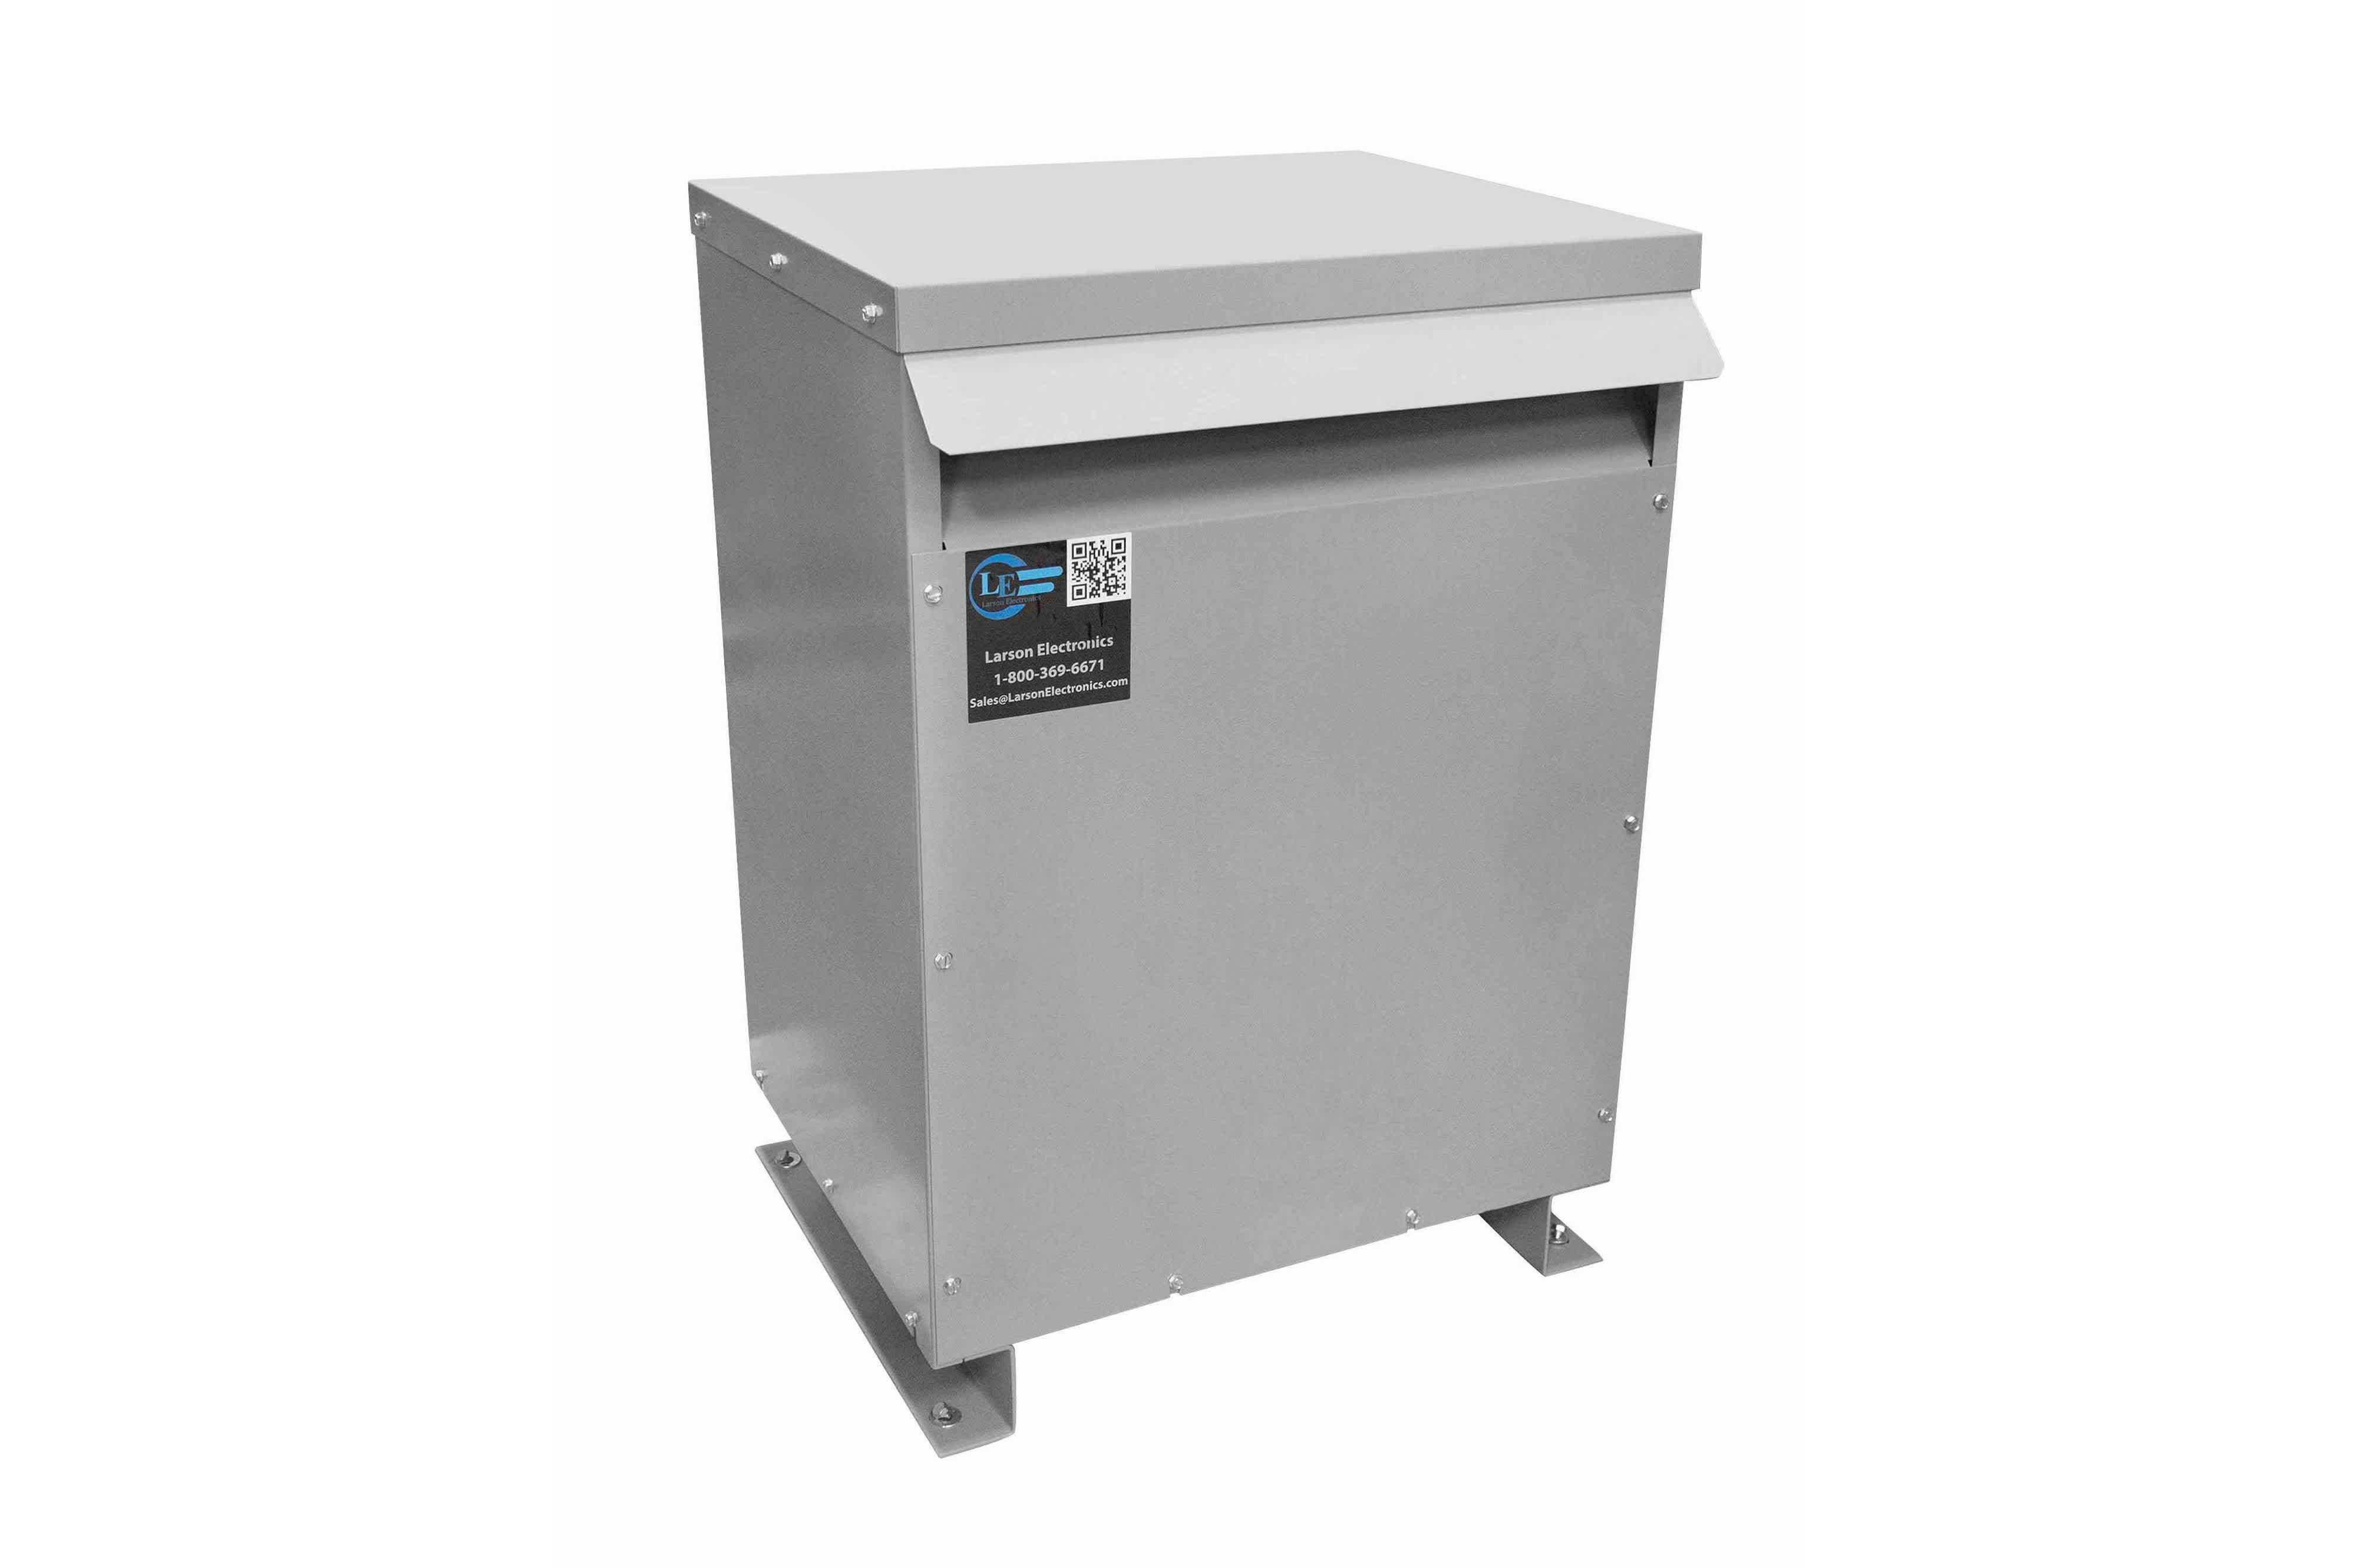 200 kVA 3PH Isolation Transformer, 440V Wye Primary, 208V Delta Secondary, N3R, Ventilated, 60 Hz